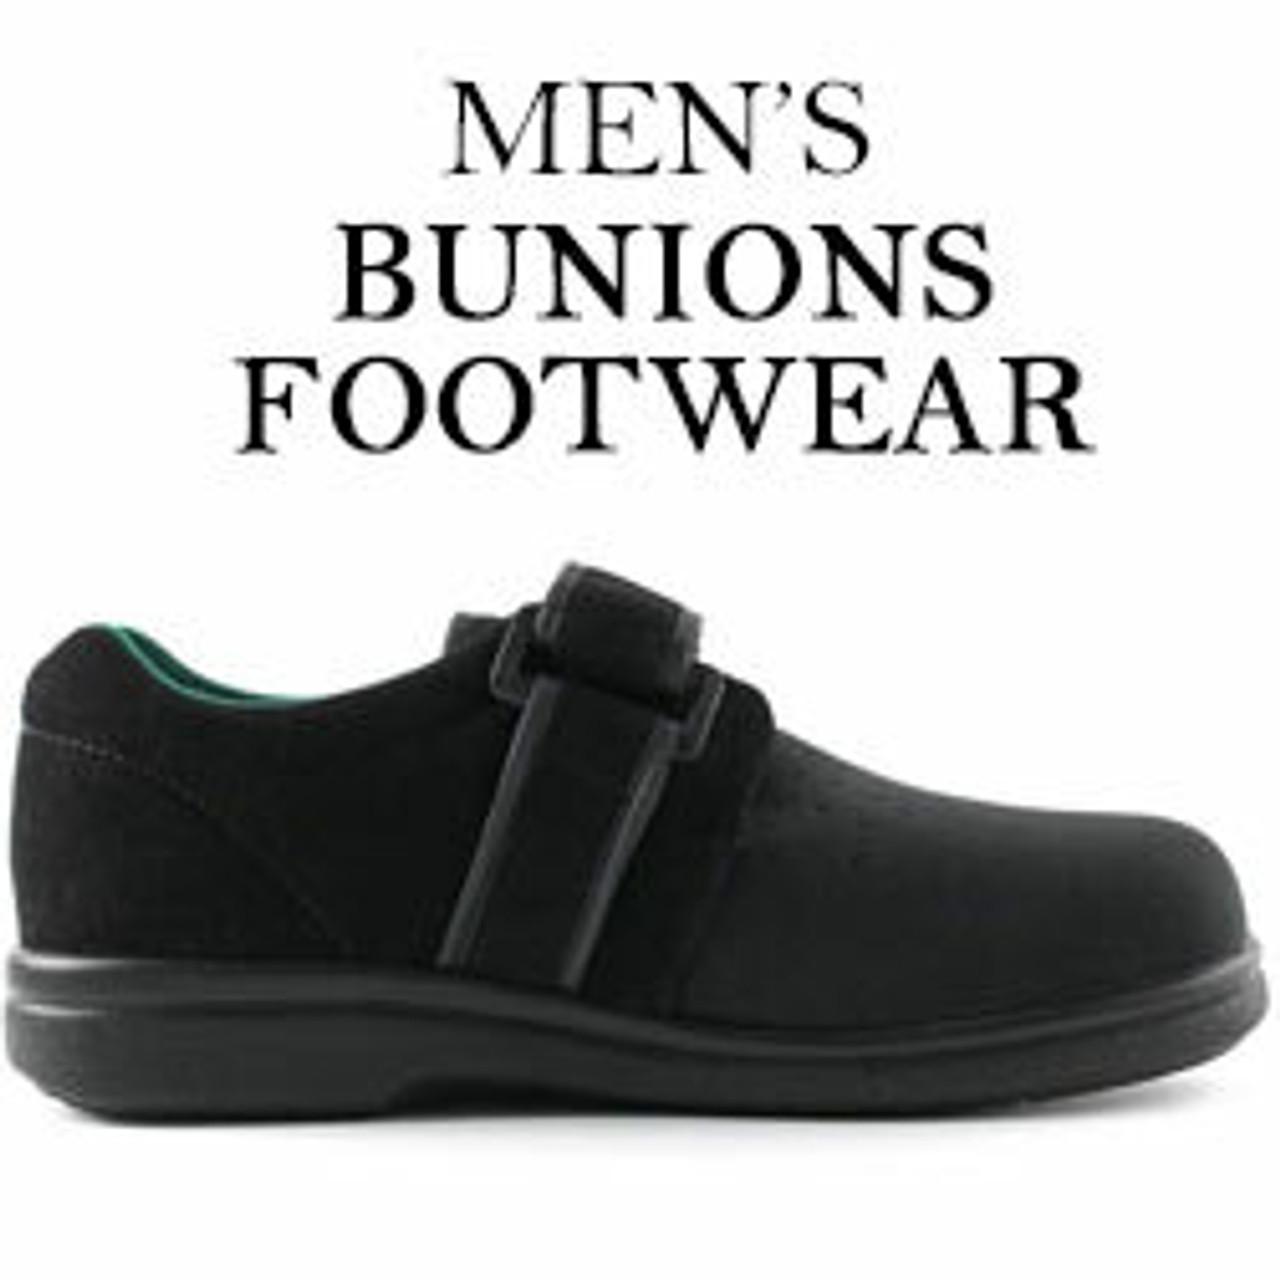 Shoes For Bunions Mens   Mens Shoes For Bunions